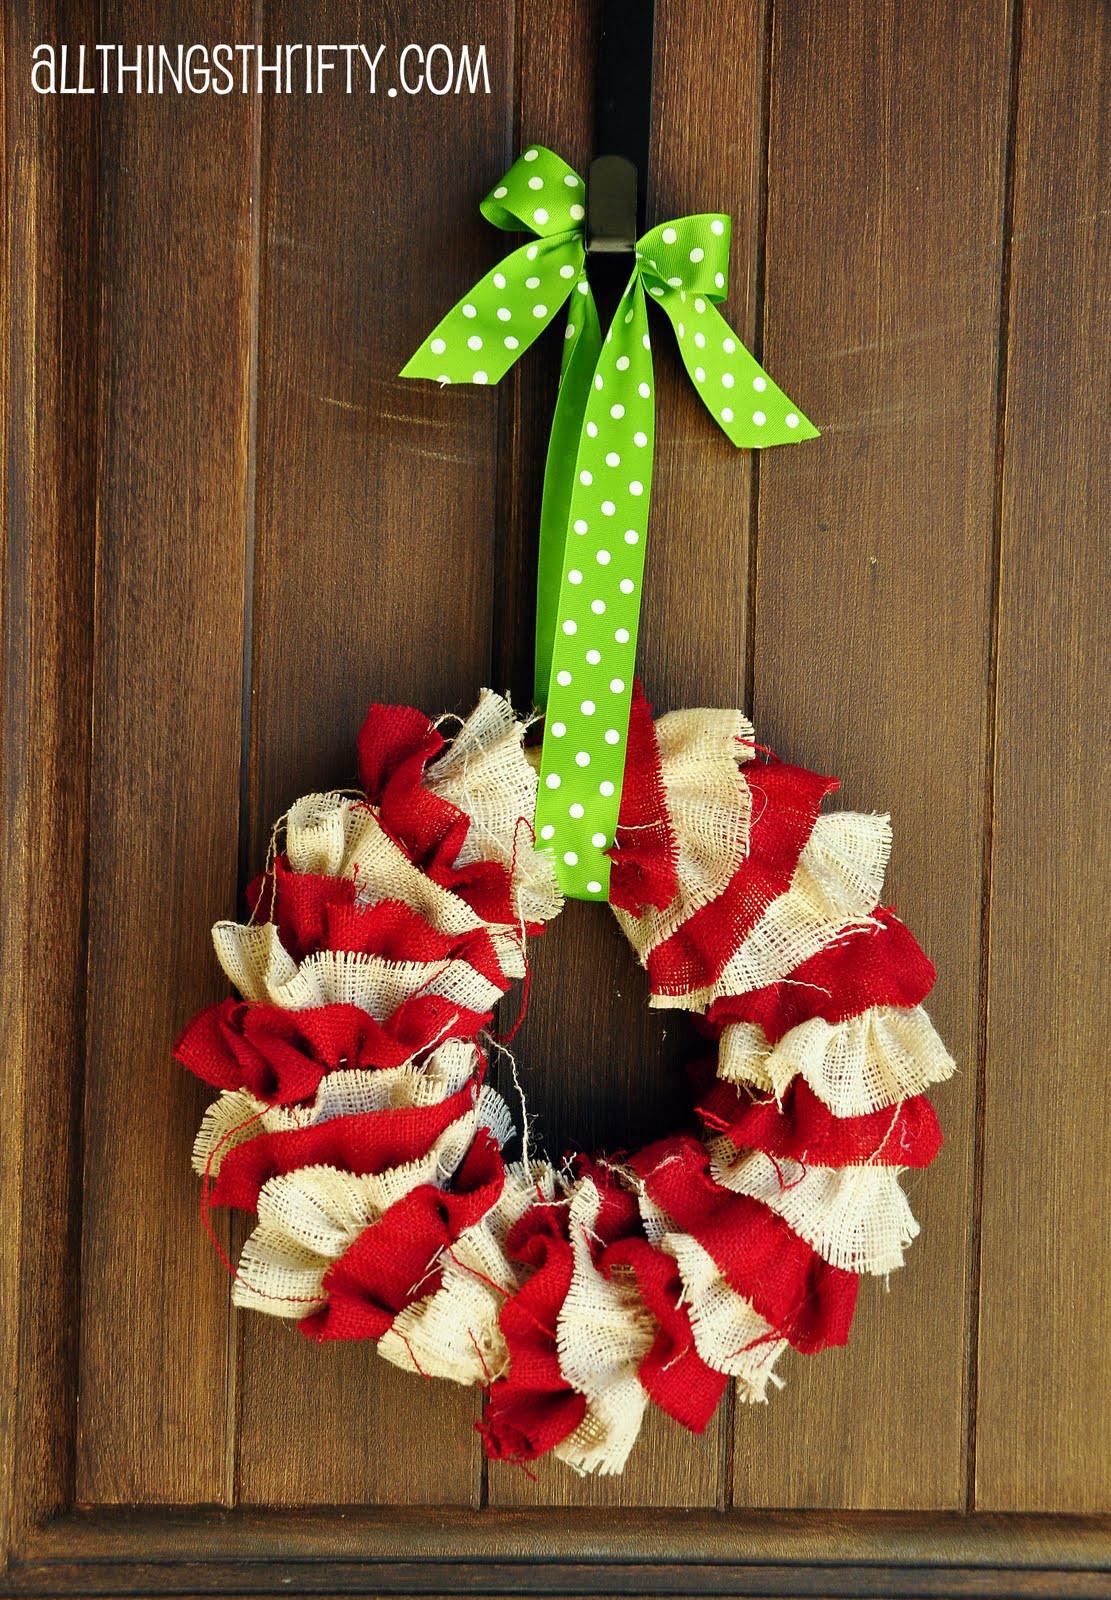 Best ideas about Easy DIY Christmas Wreaths . Save or Pin Tutorial DIY Christmas Wreath Now.